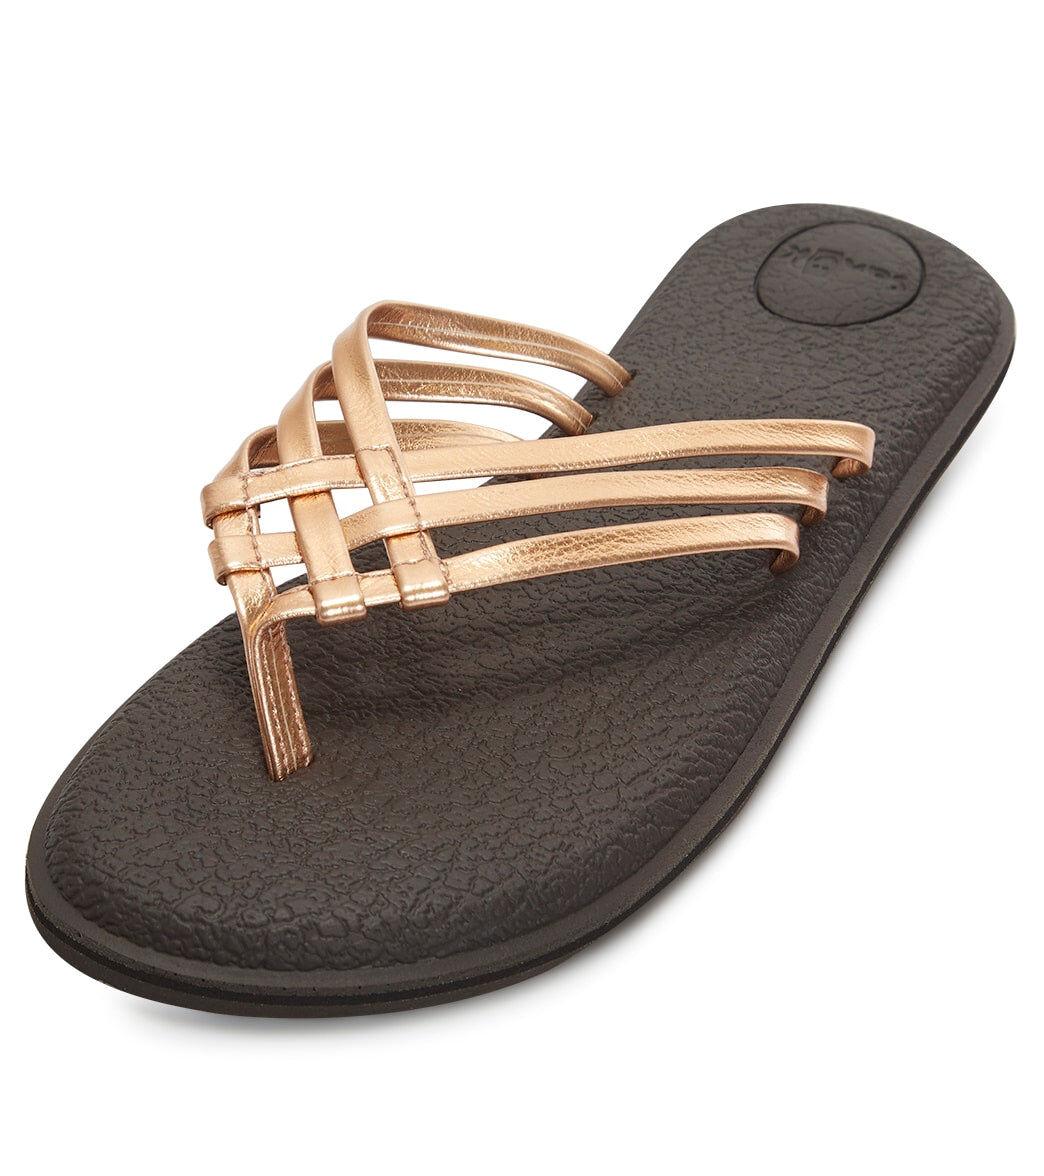 Sanuk Women's Yoga Salty Metallic Sandal - Copper 10